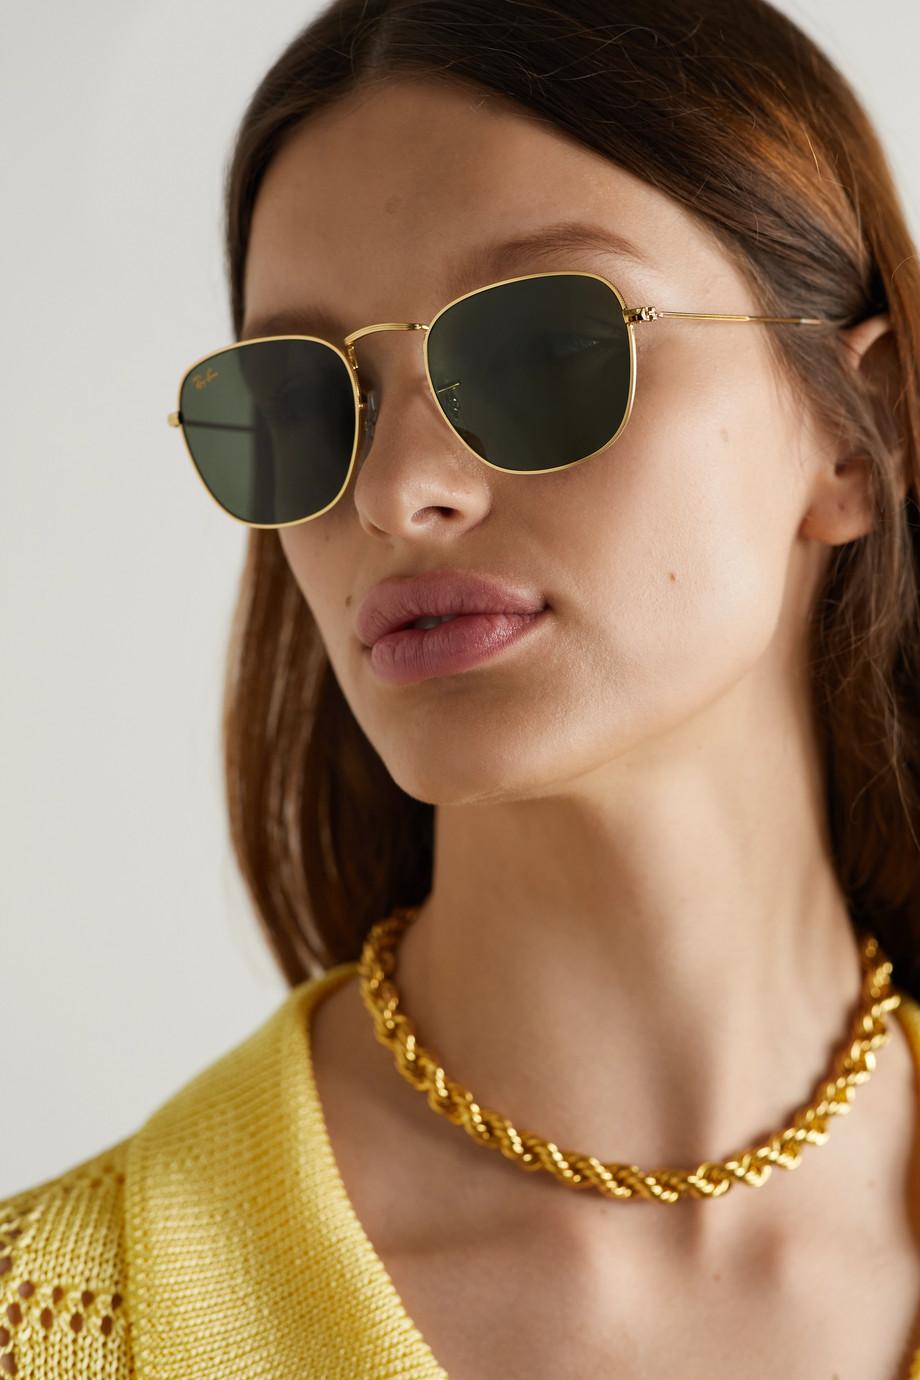 Ray-Ban Frank square-frame gold-tone sunglasses